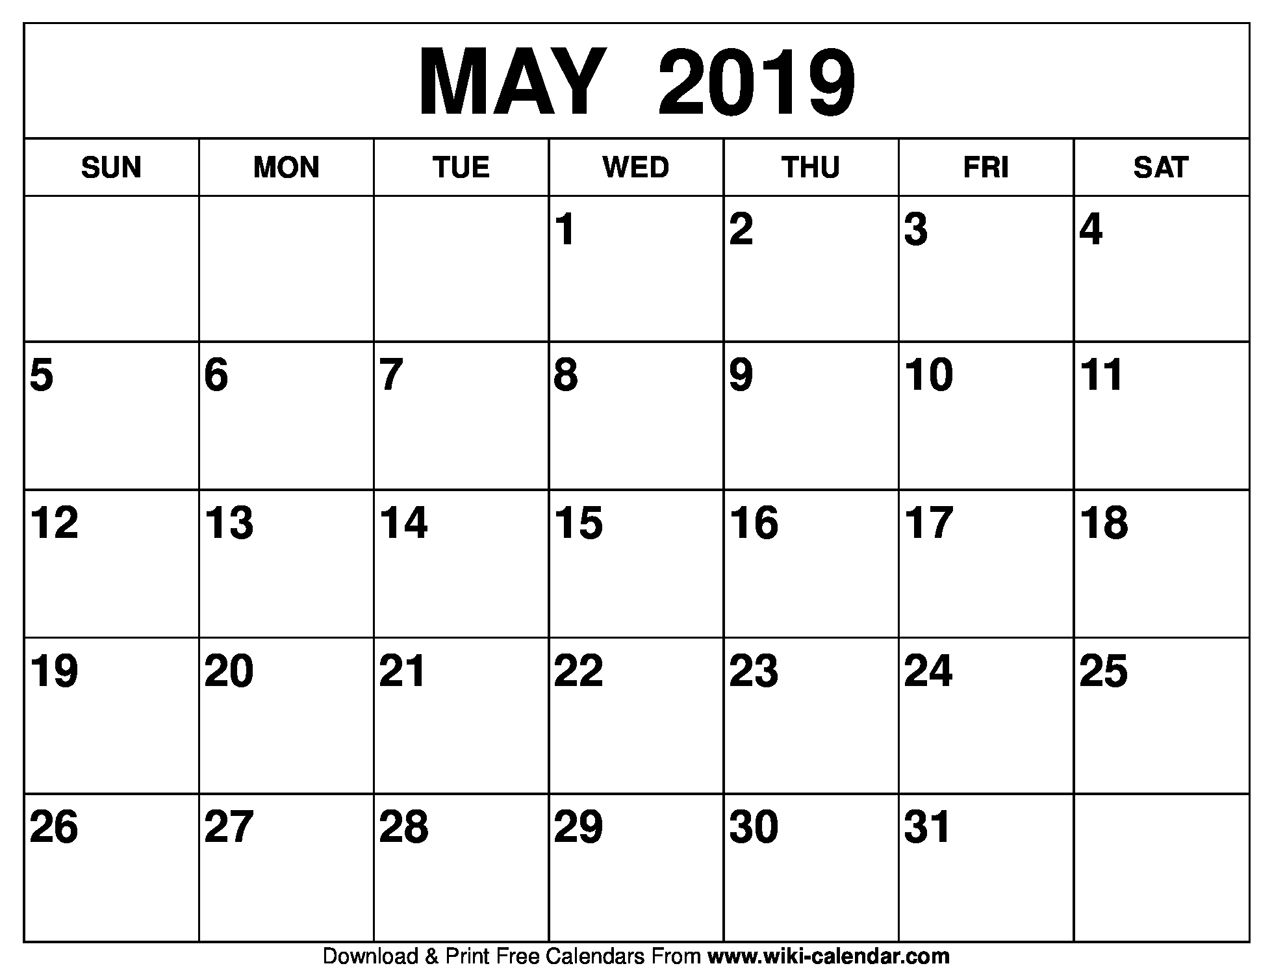 May 2019 Calendar Editable Calendar Printable Calendar July Calendar Template